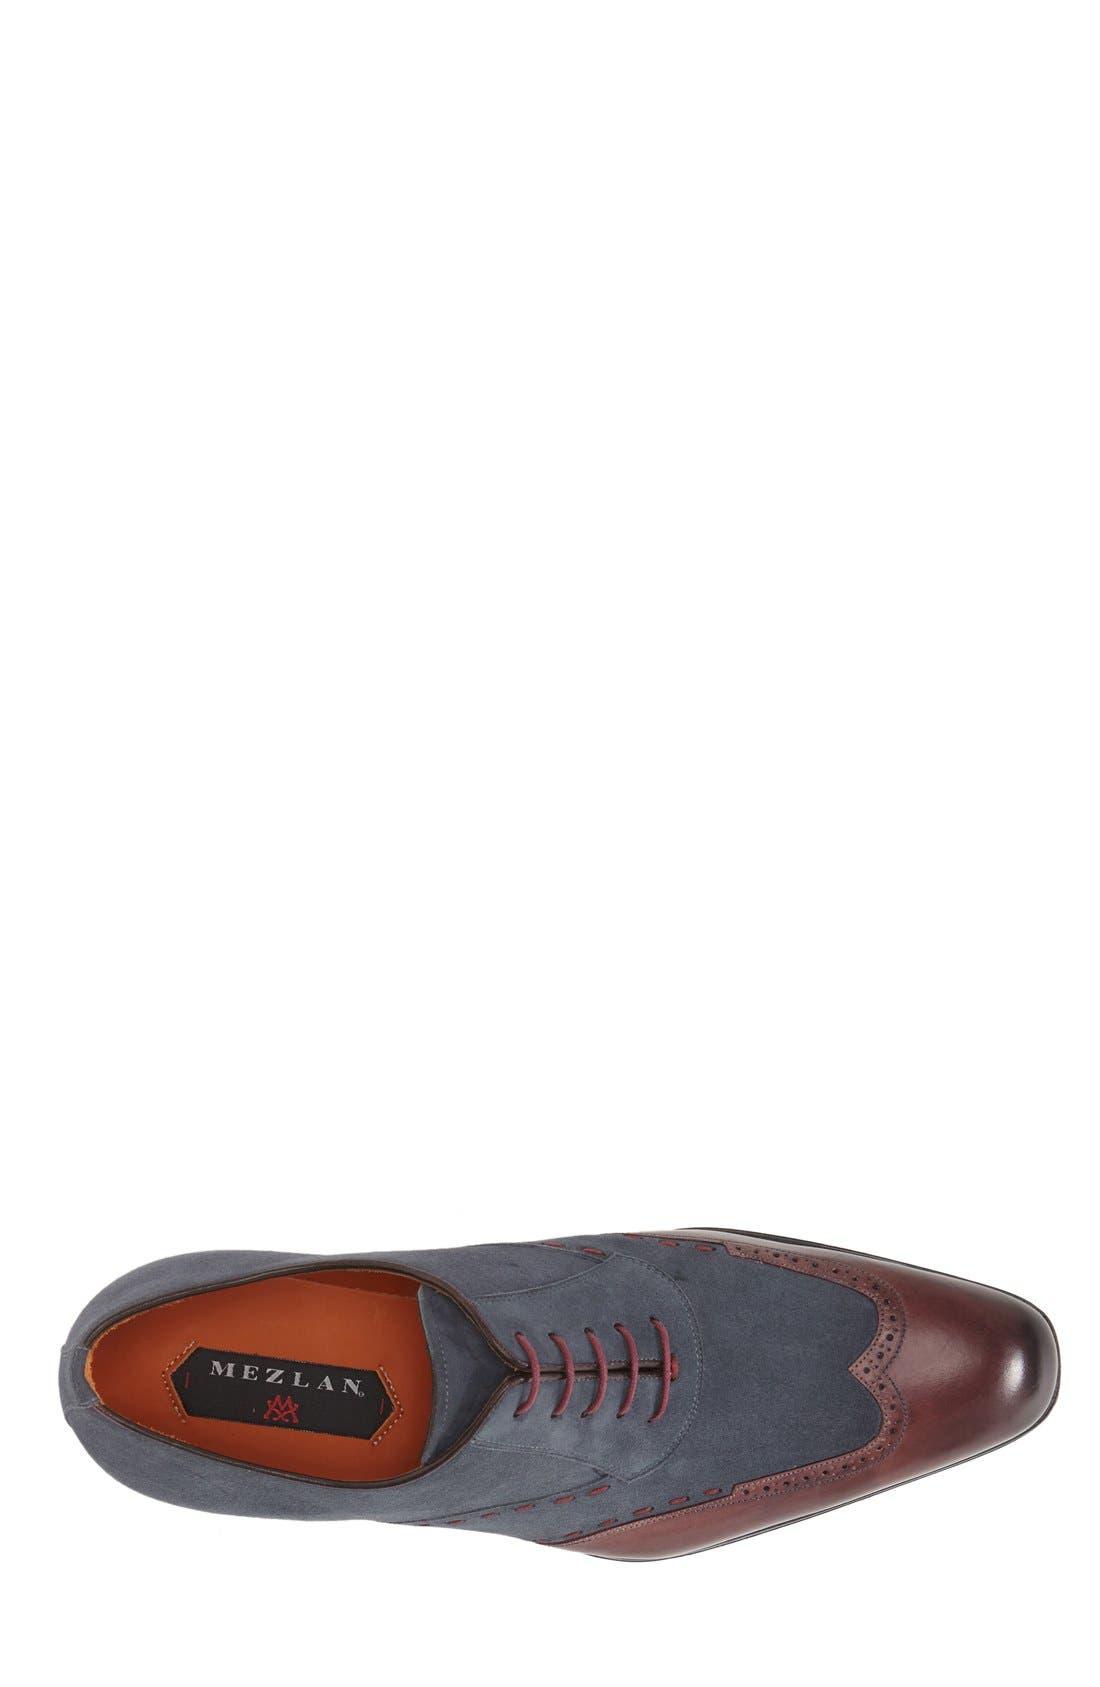 'Ronda' Spectator Shoe,                             Alternate thumbnail 2, color,                             BURGUNDY/ GREY